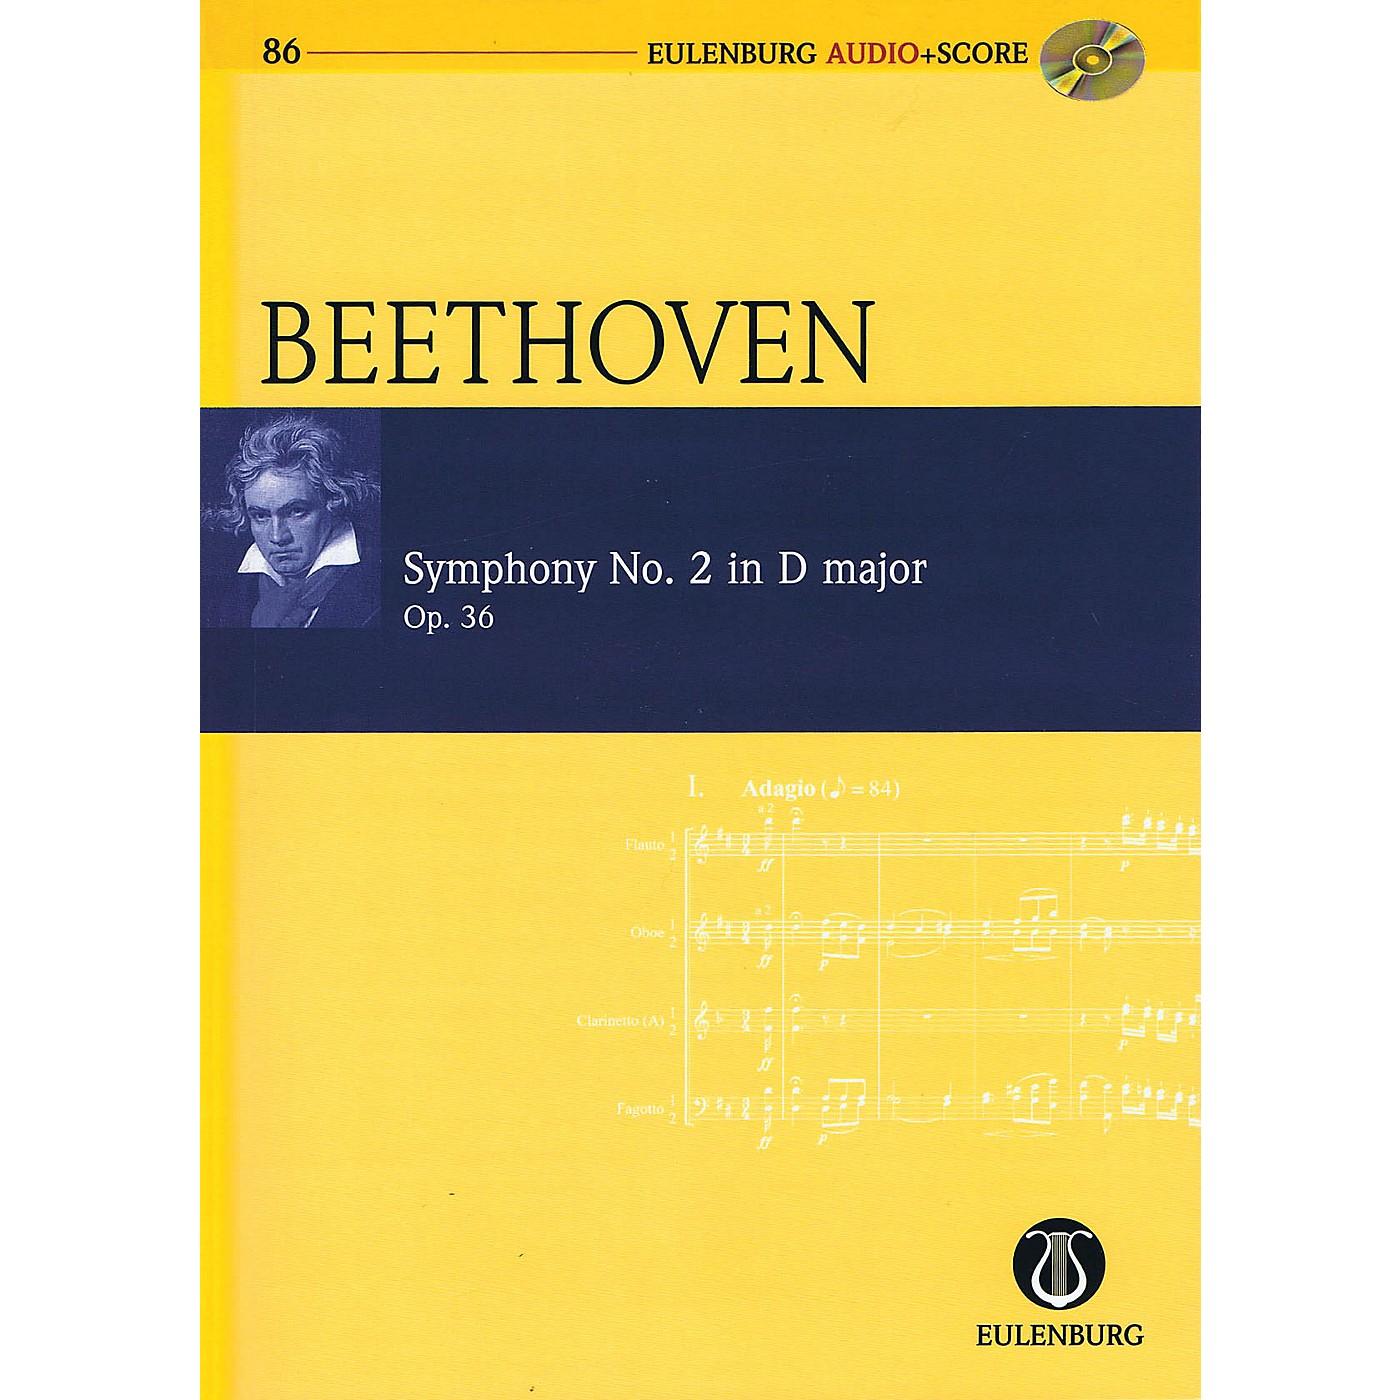 Eulenburg Symphony No. 2 in D Major, Op. 36 Eulenberg Audio plus Score w/ CD by Beethoven Edited by Richard Clarke thumbnail